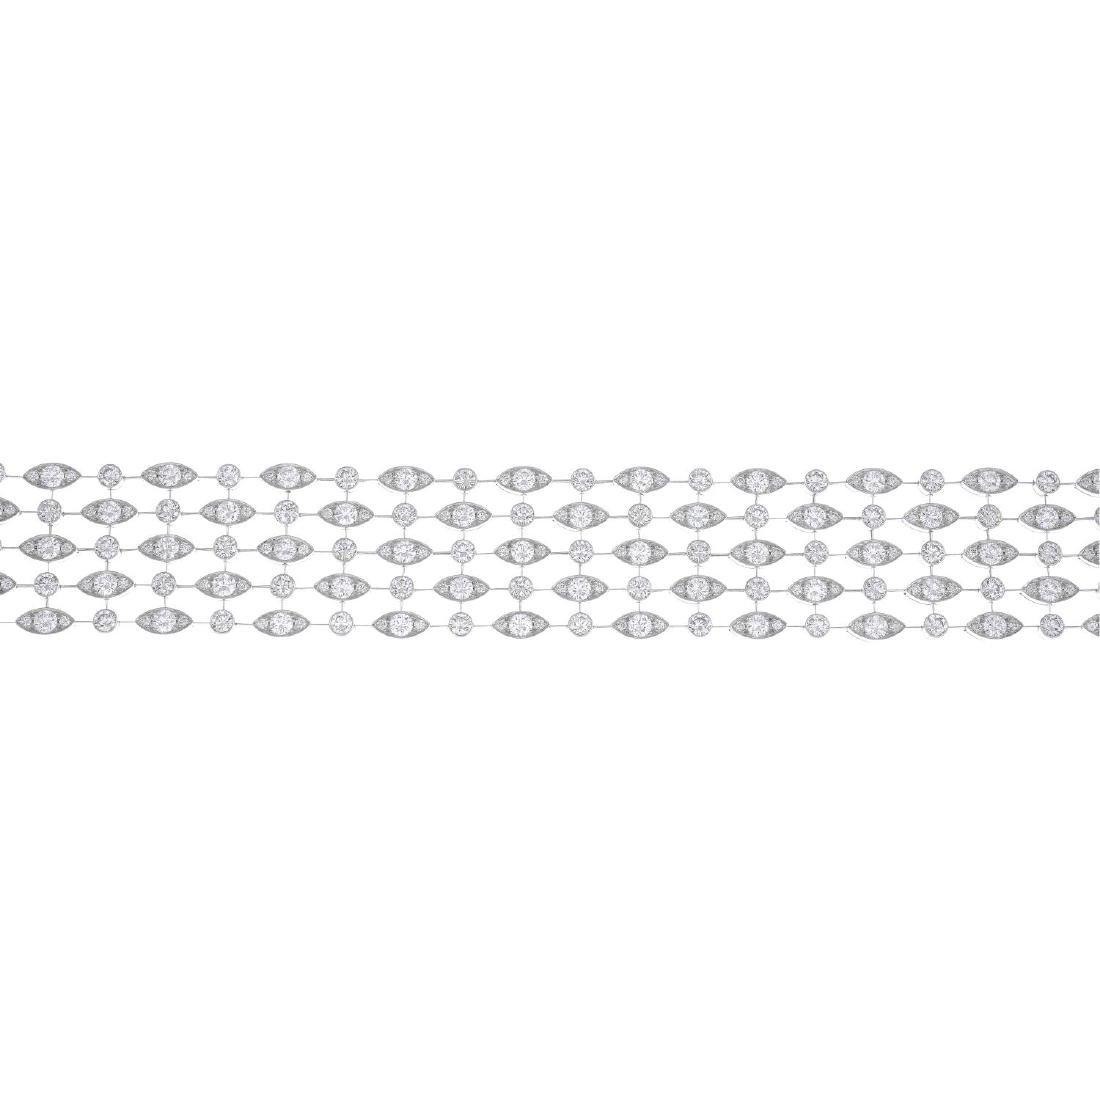 CARTIER - an 18ct gold diamond 'Naide' bracelet. The